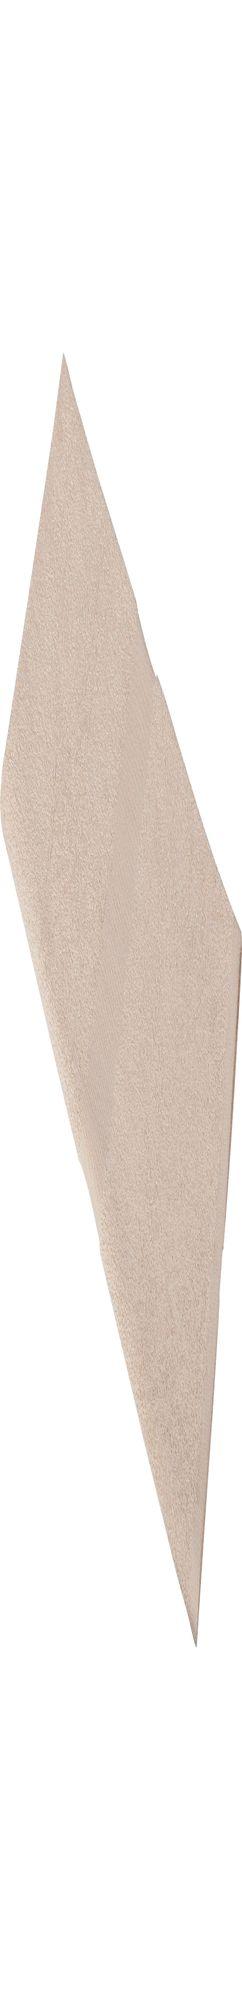 Полотенце махровое Medium, бежевое фото